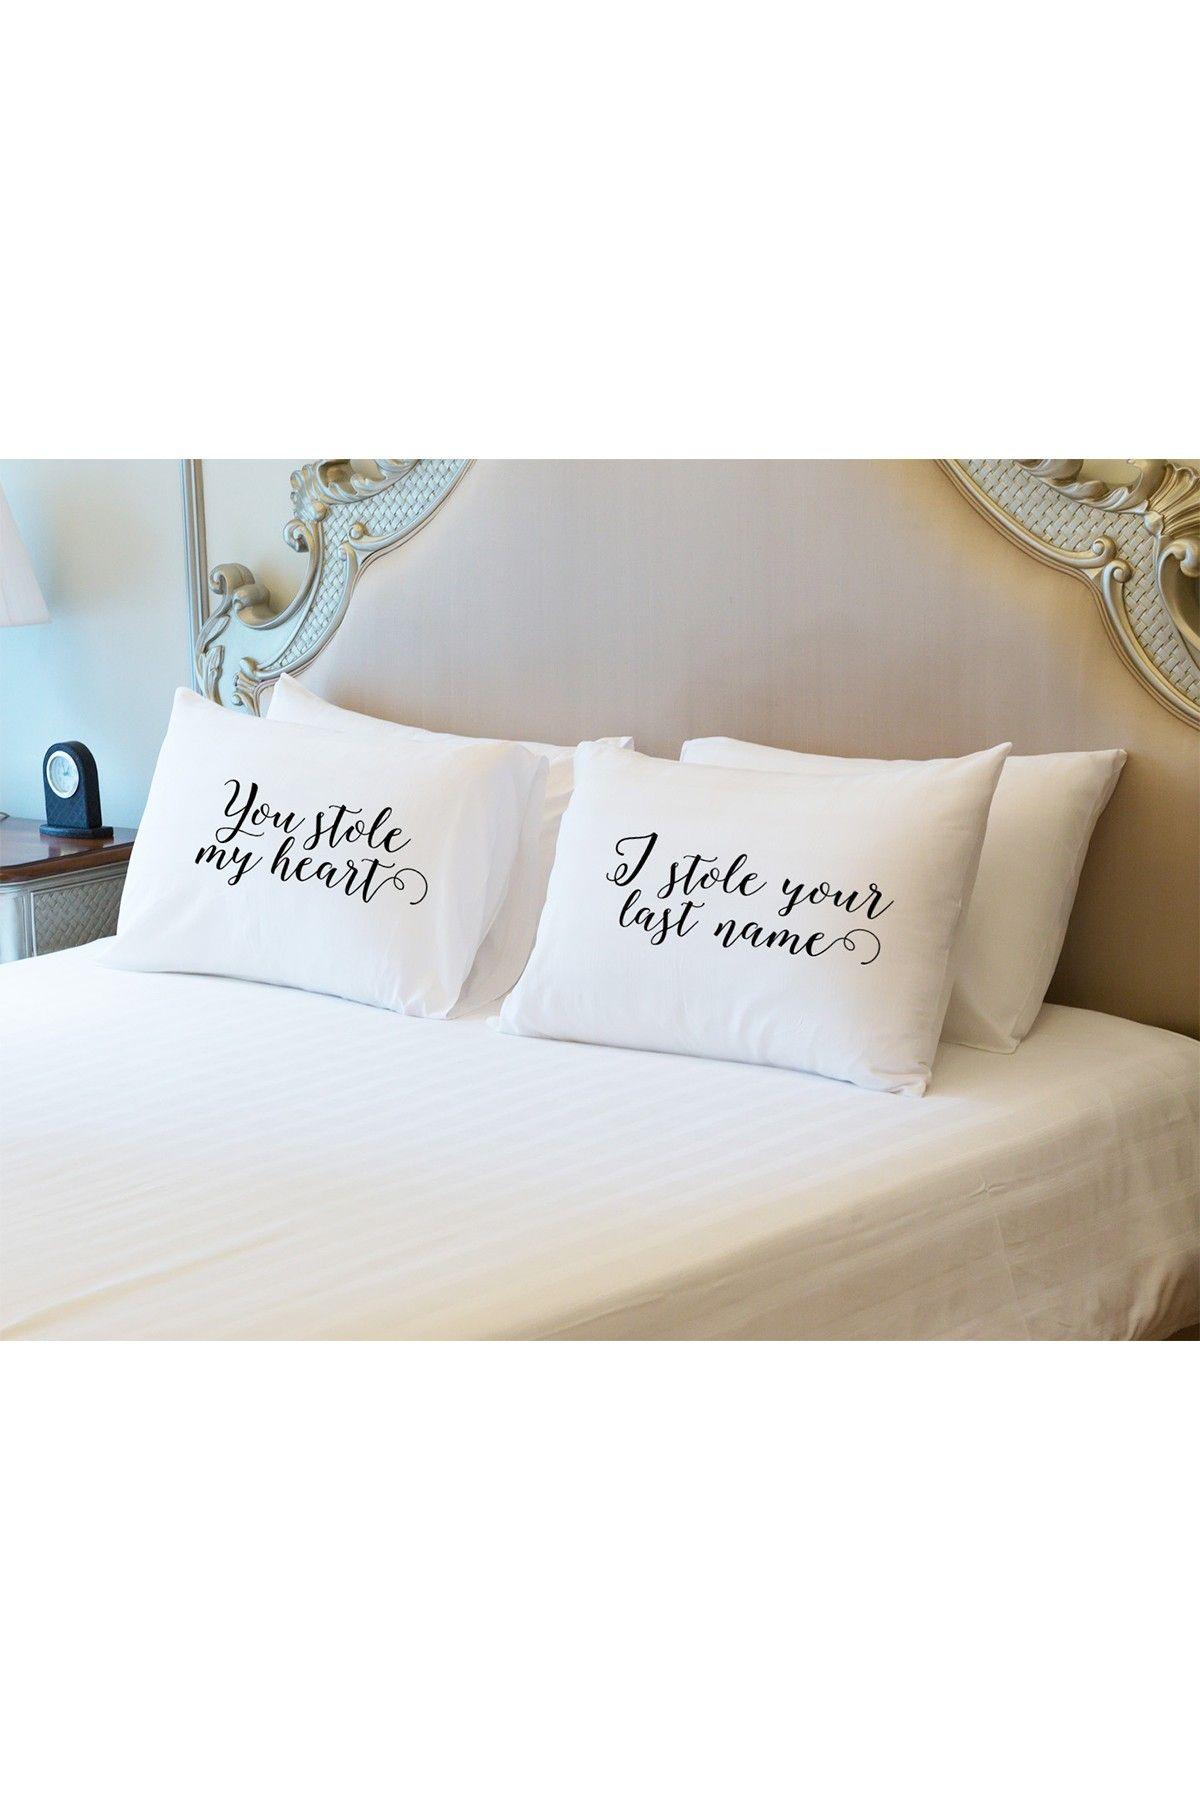 Lightning E Commerce Steal Last Name Pillowcase Set Of 2 Hautelook Pillow Cases Pillow Case Sets Standard Pillow